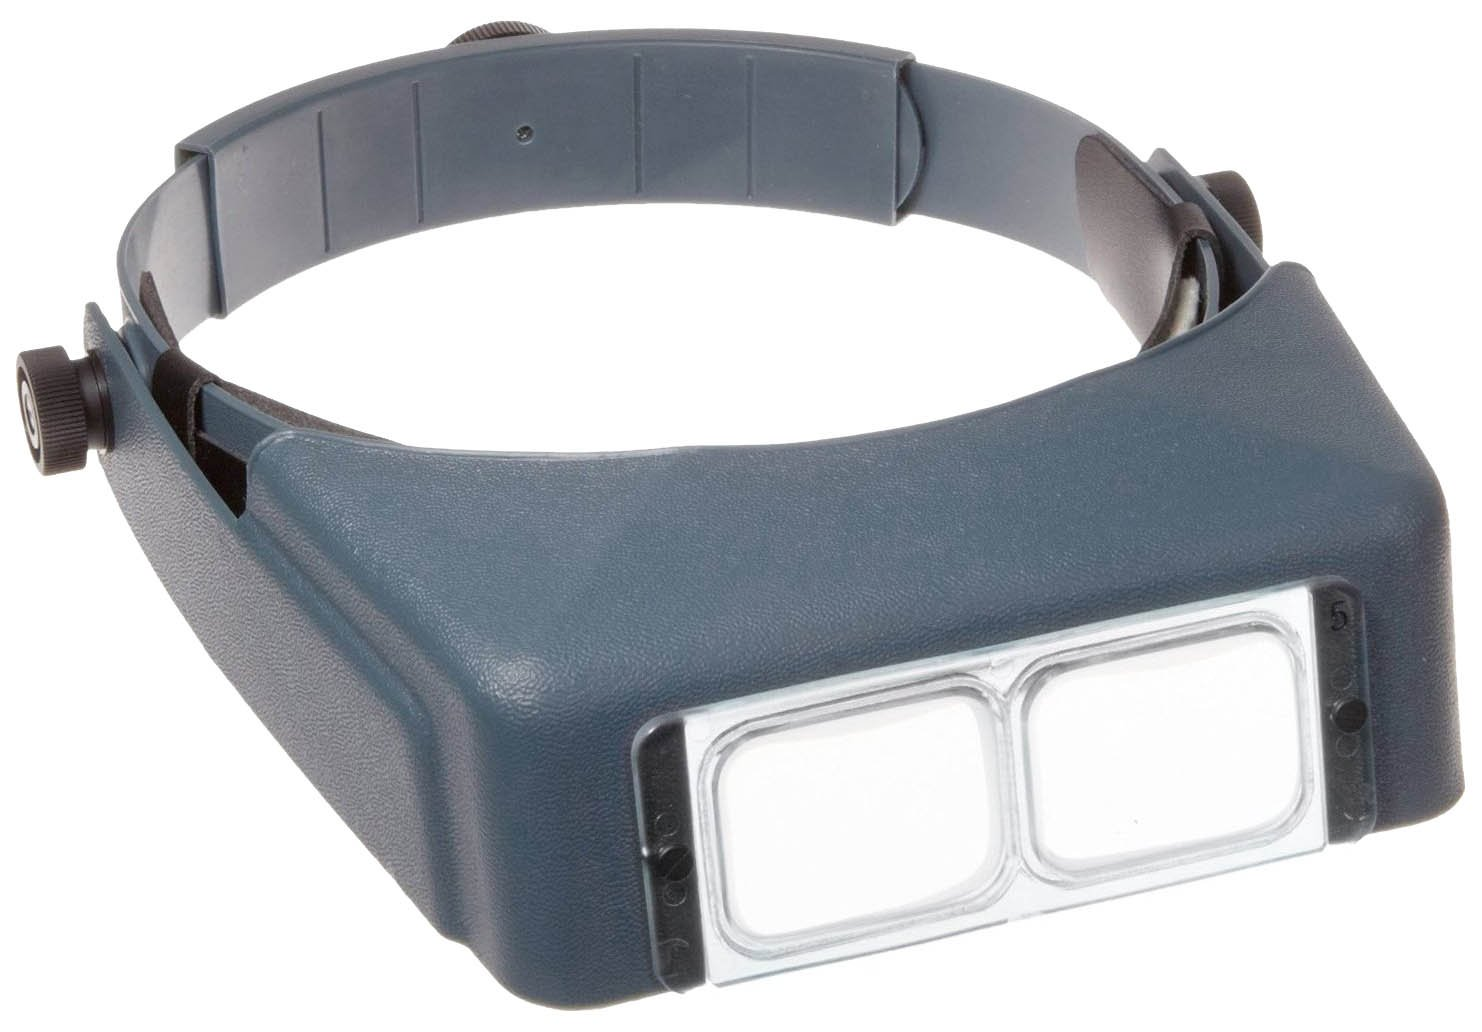 25,4/cm Donegan /óptico Visera LX prism/áticos Magnifier-lensplate # 4/magnifies 2/x en